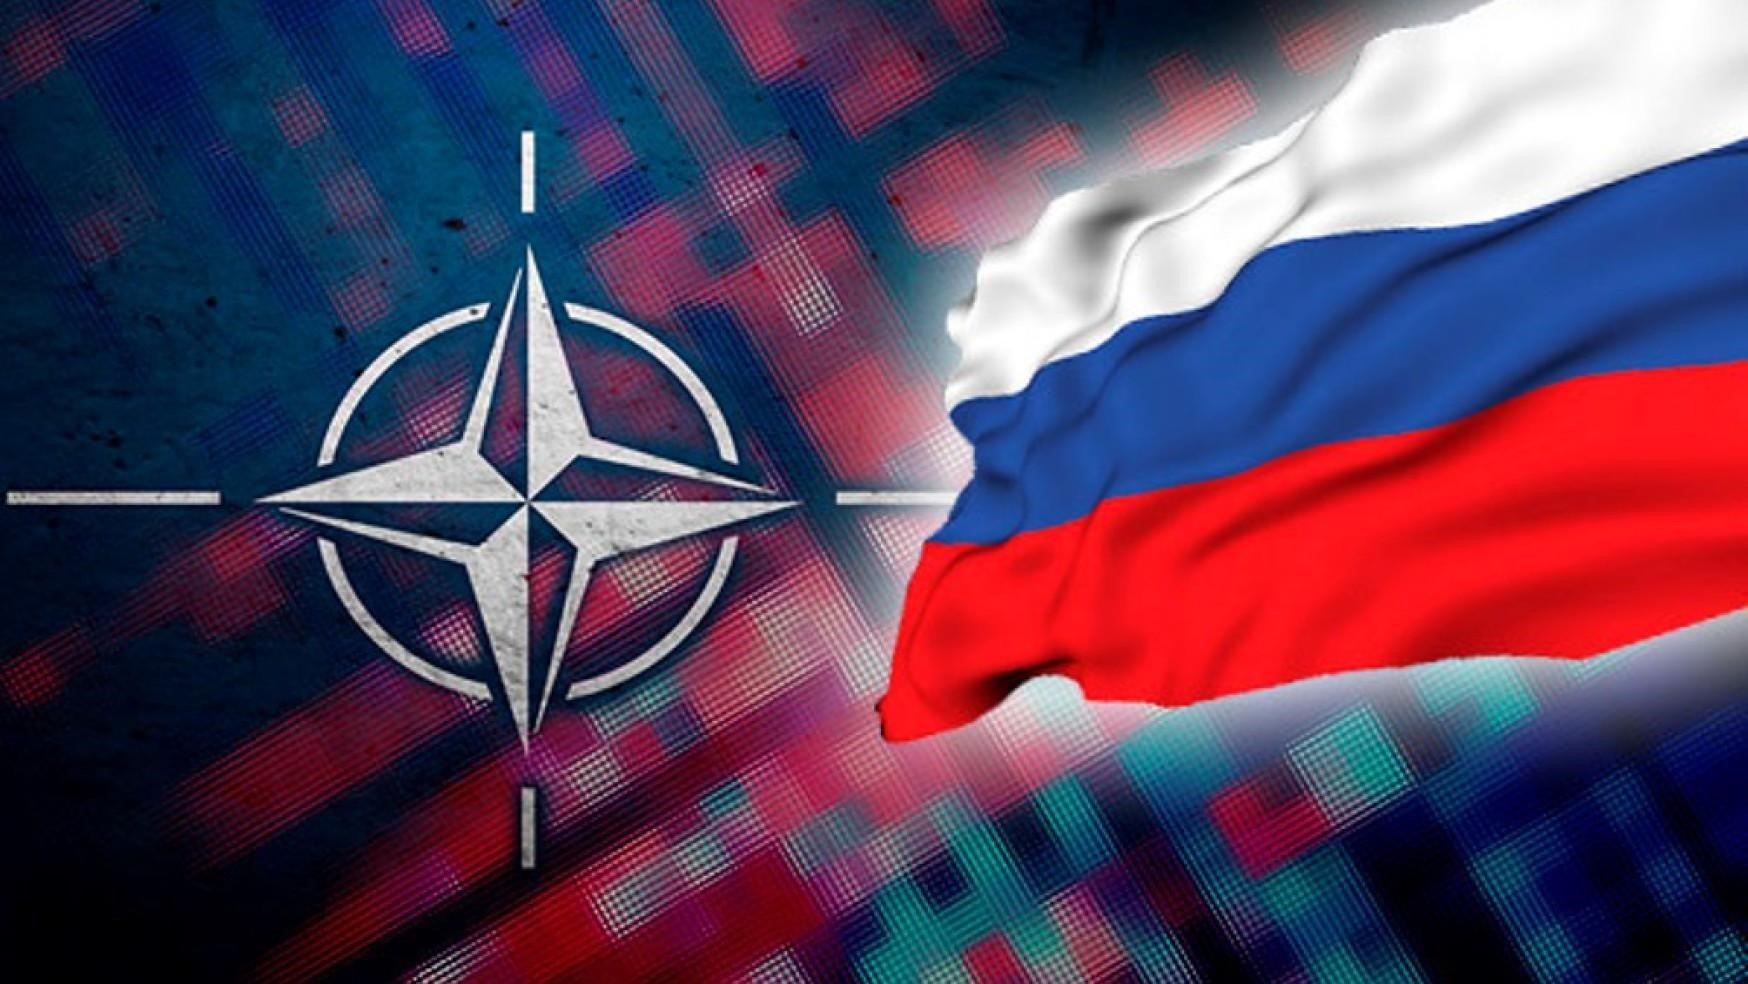 Сотрудники НАТО говорили о сокращении натреть постпредстваРФ при организации